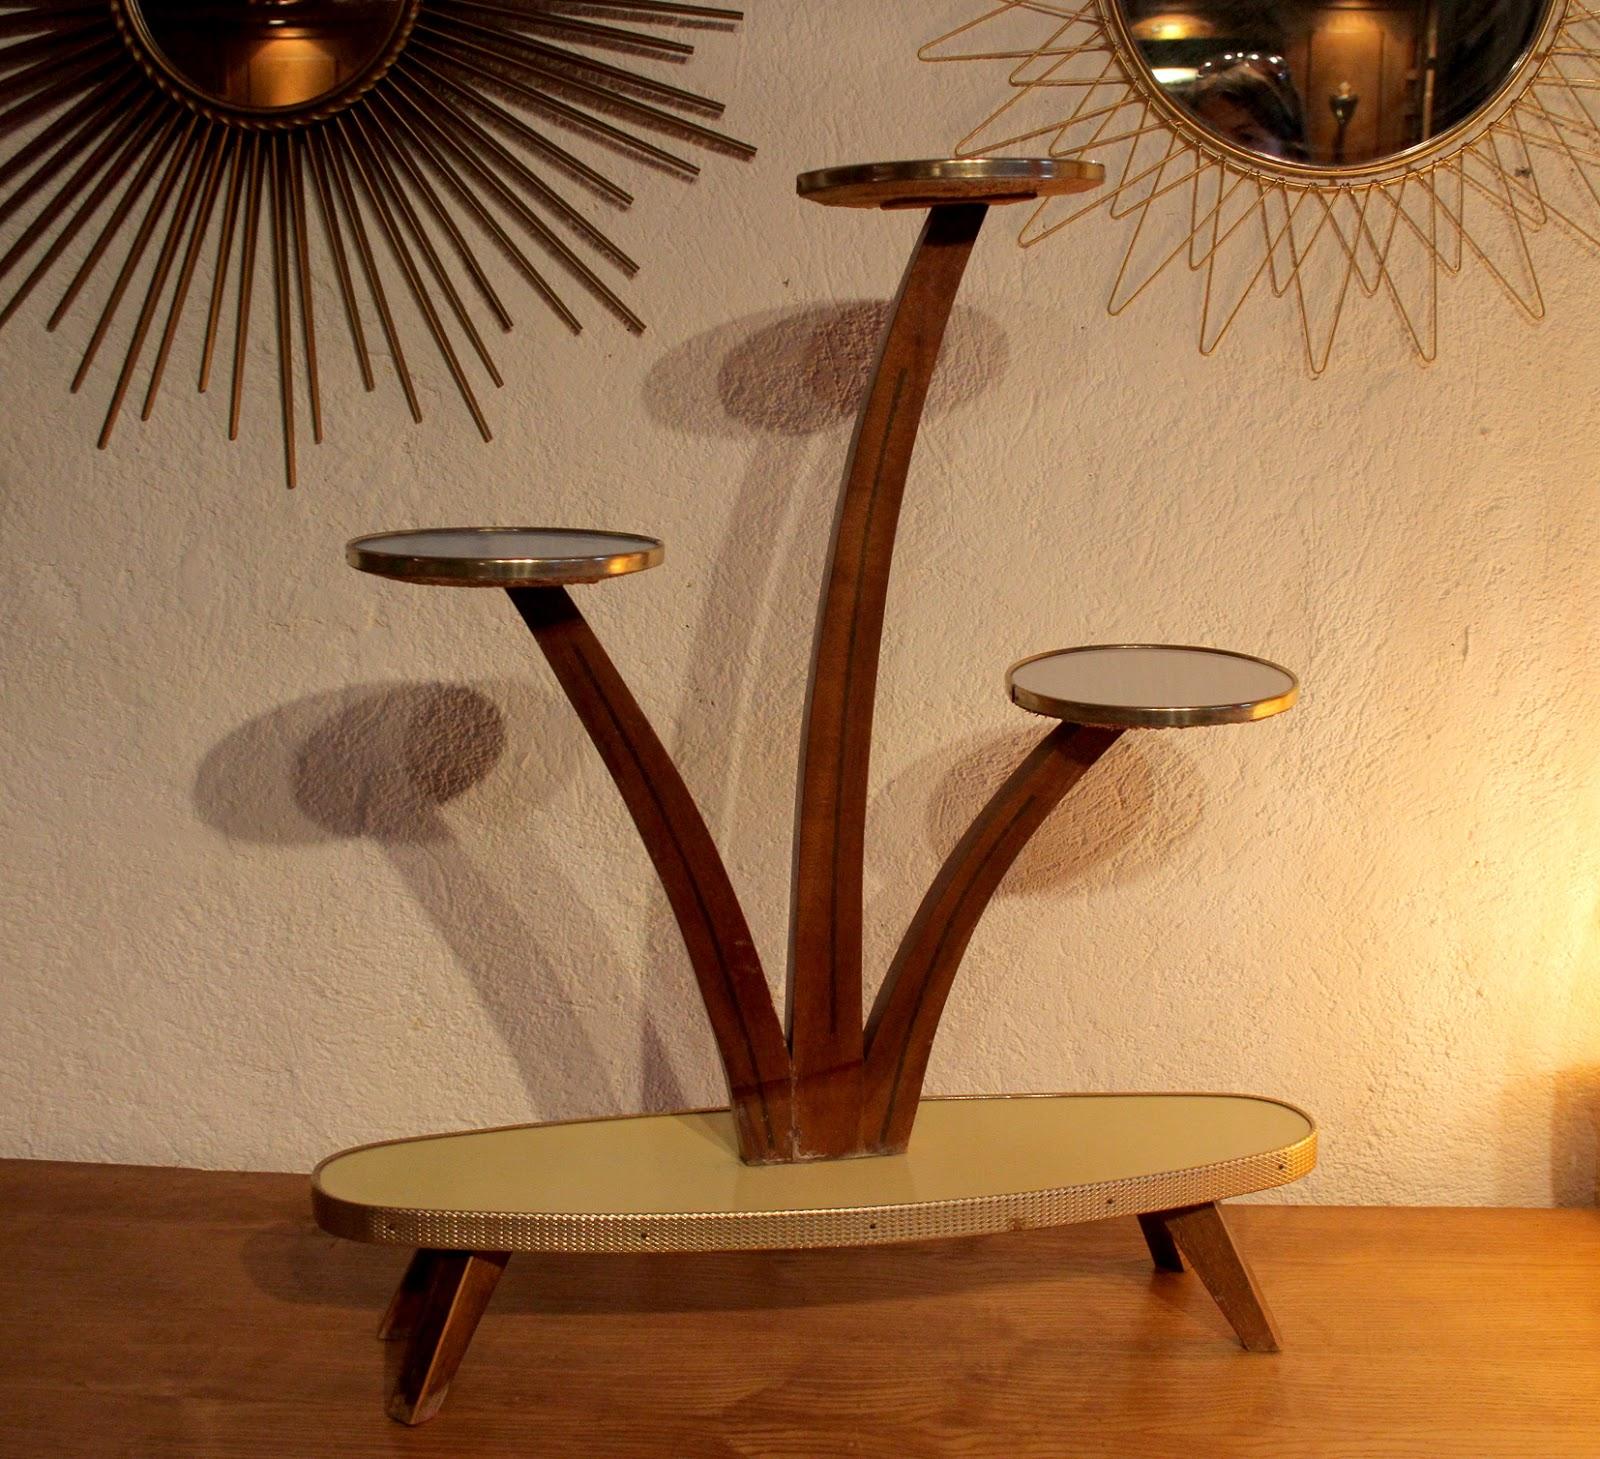 Chicbaazar objets vintage 50 60 70 porte plantes pots - Miroir chaty vallauris prix ...